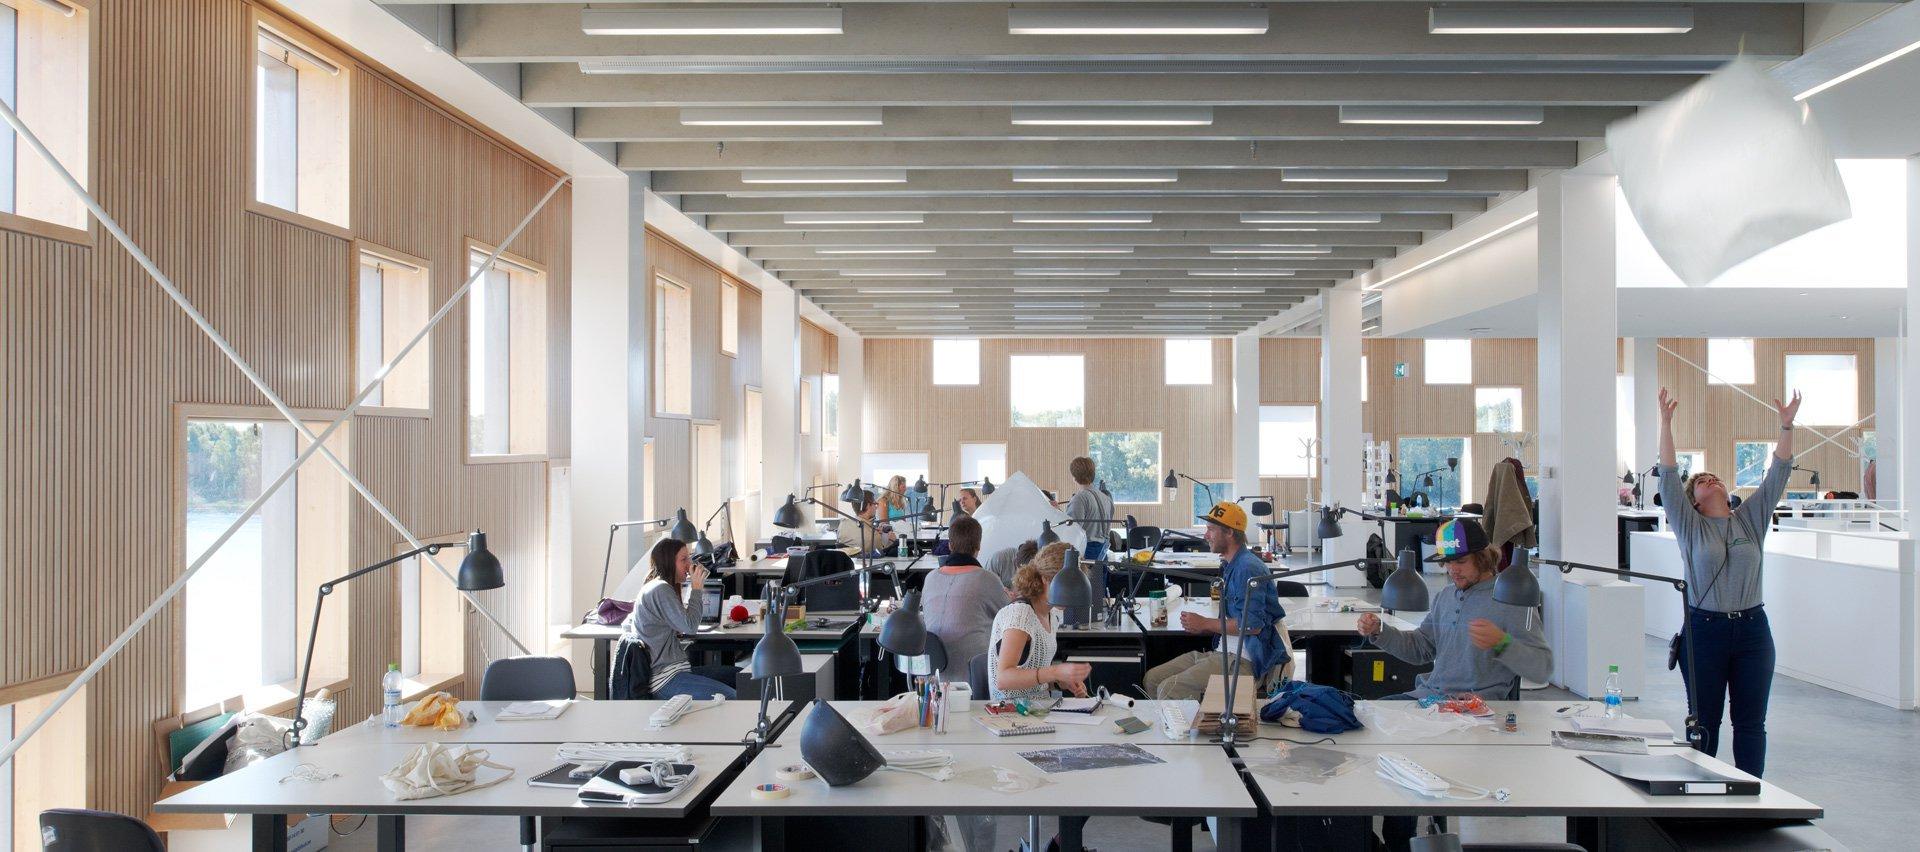 London School Of Architecture And Interior Design